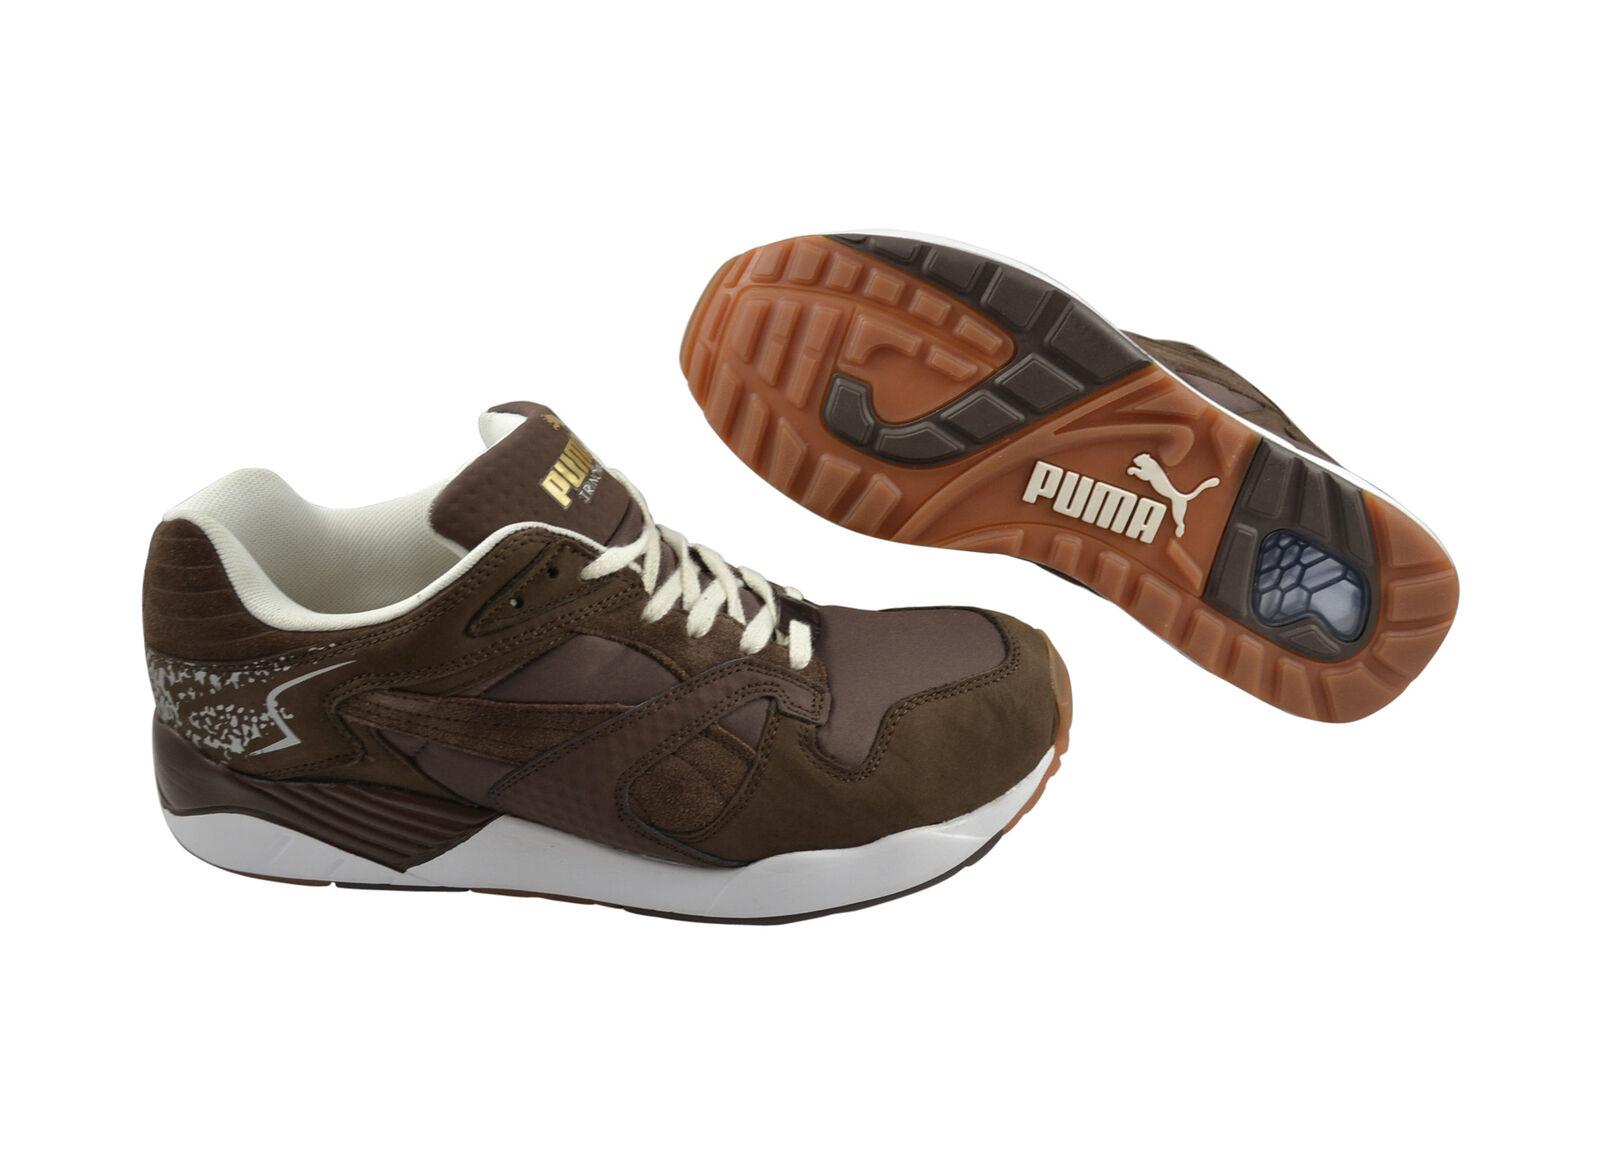 Puma trinomic XS 850 plus n. Calm carafe Marshmallow zapatos cortos 357004 02